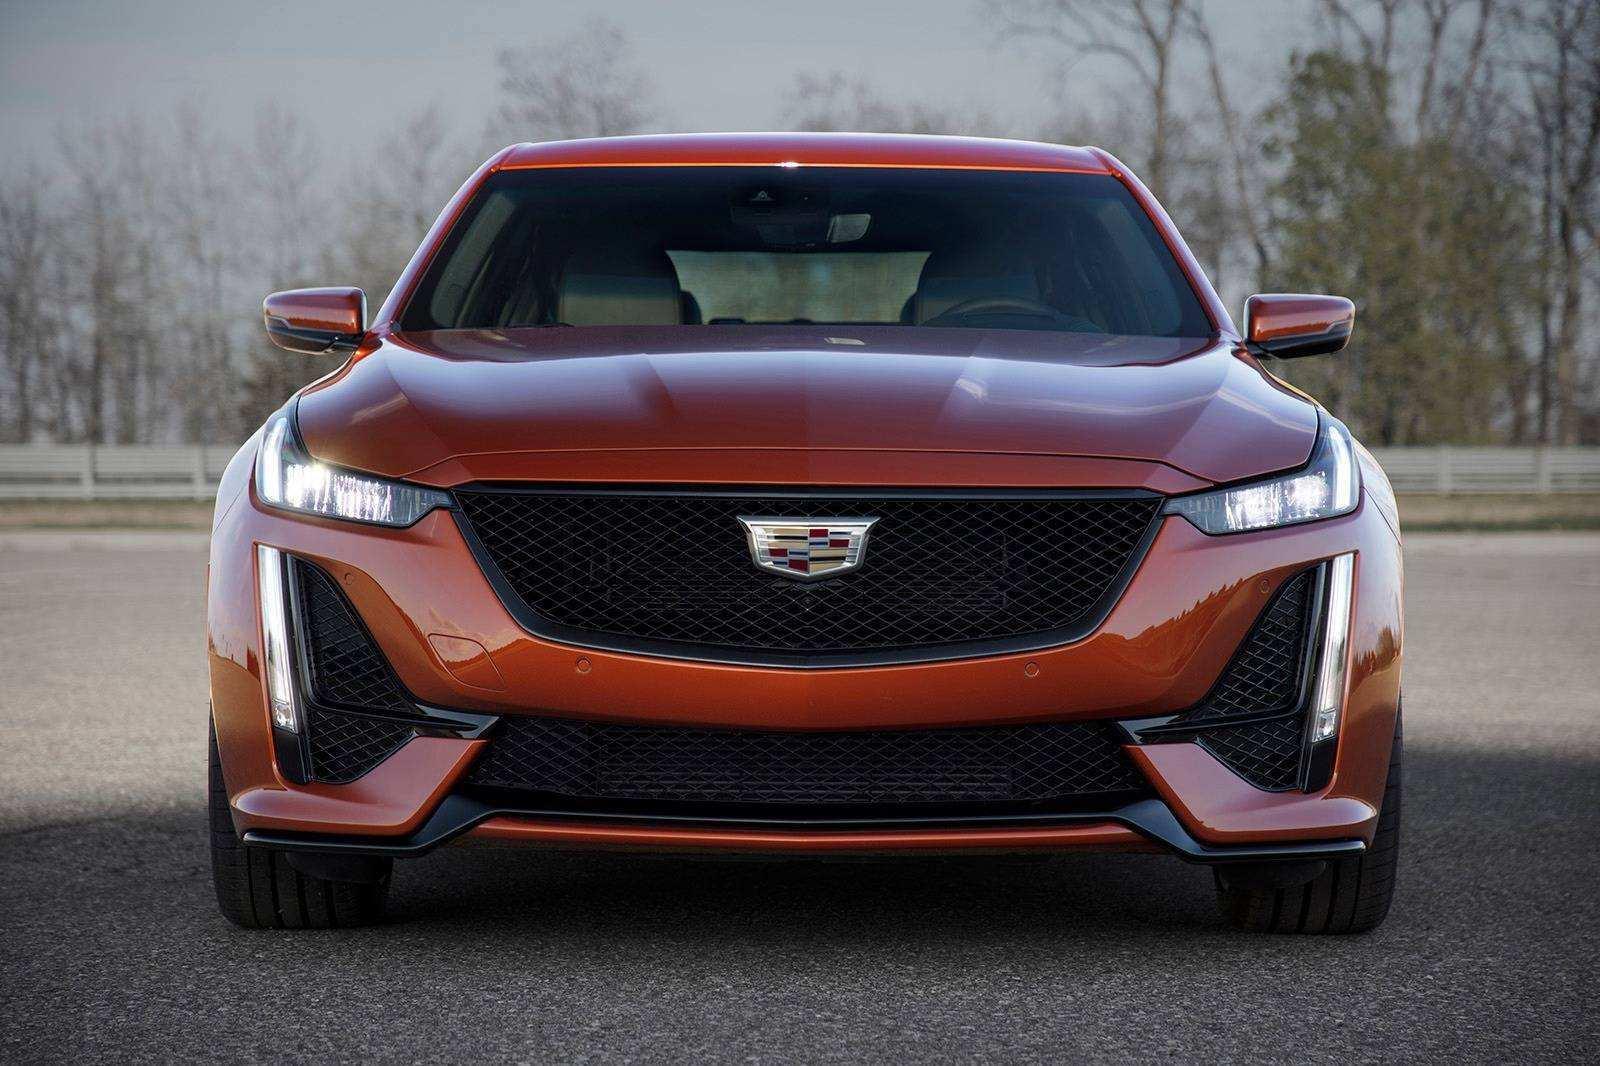 36 Gallery of Cadillac Supercar 2020 Spy Shoot with Cadillac Supercar 2020